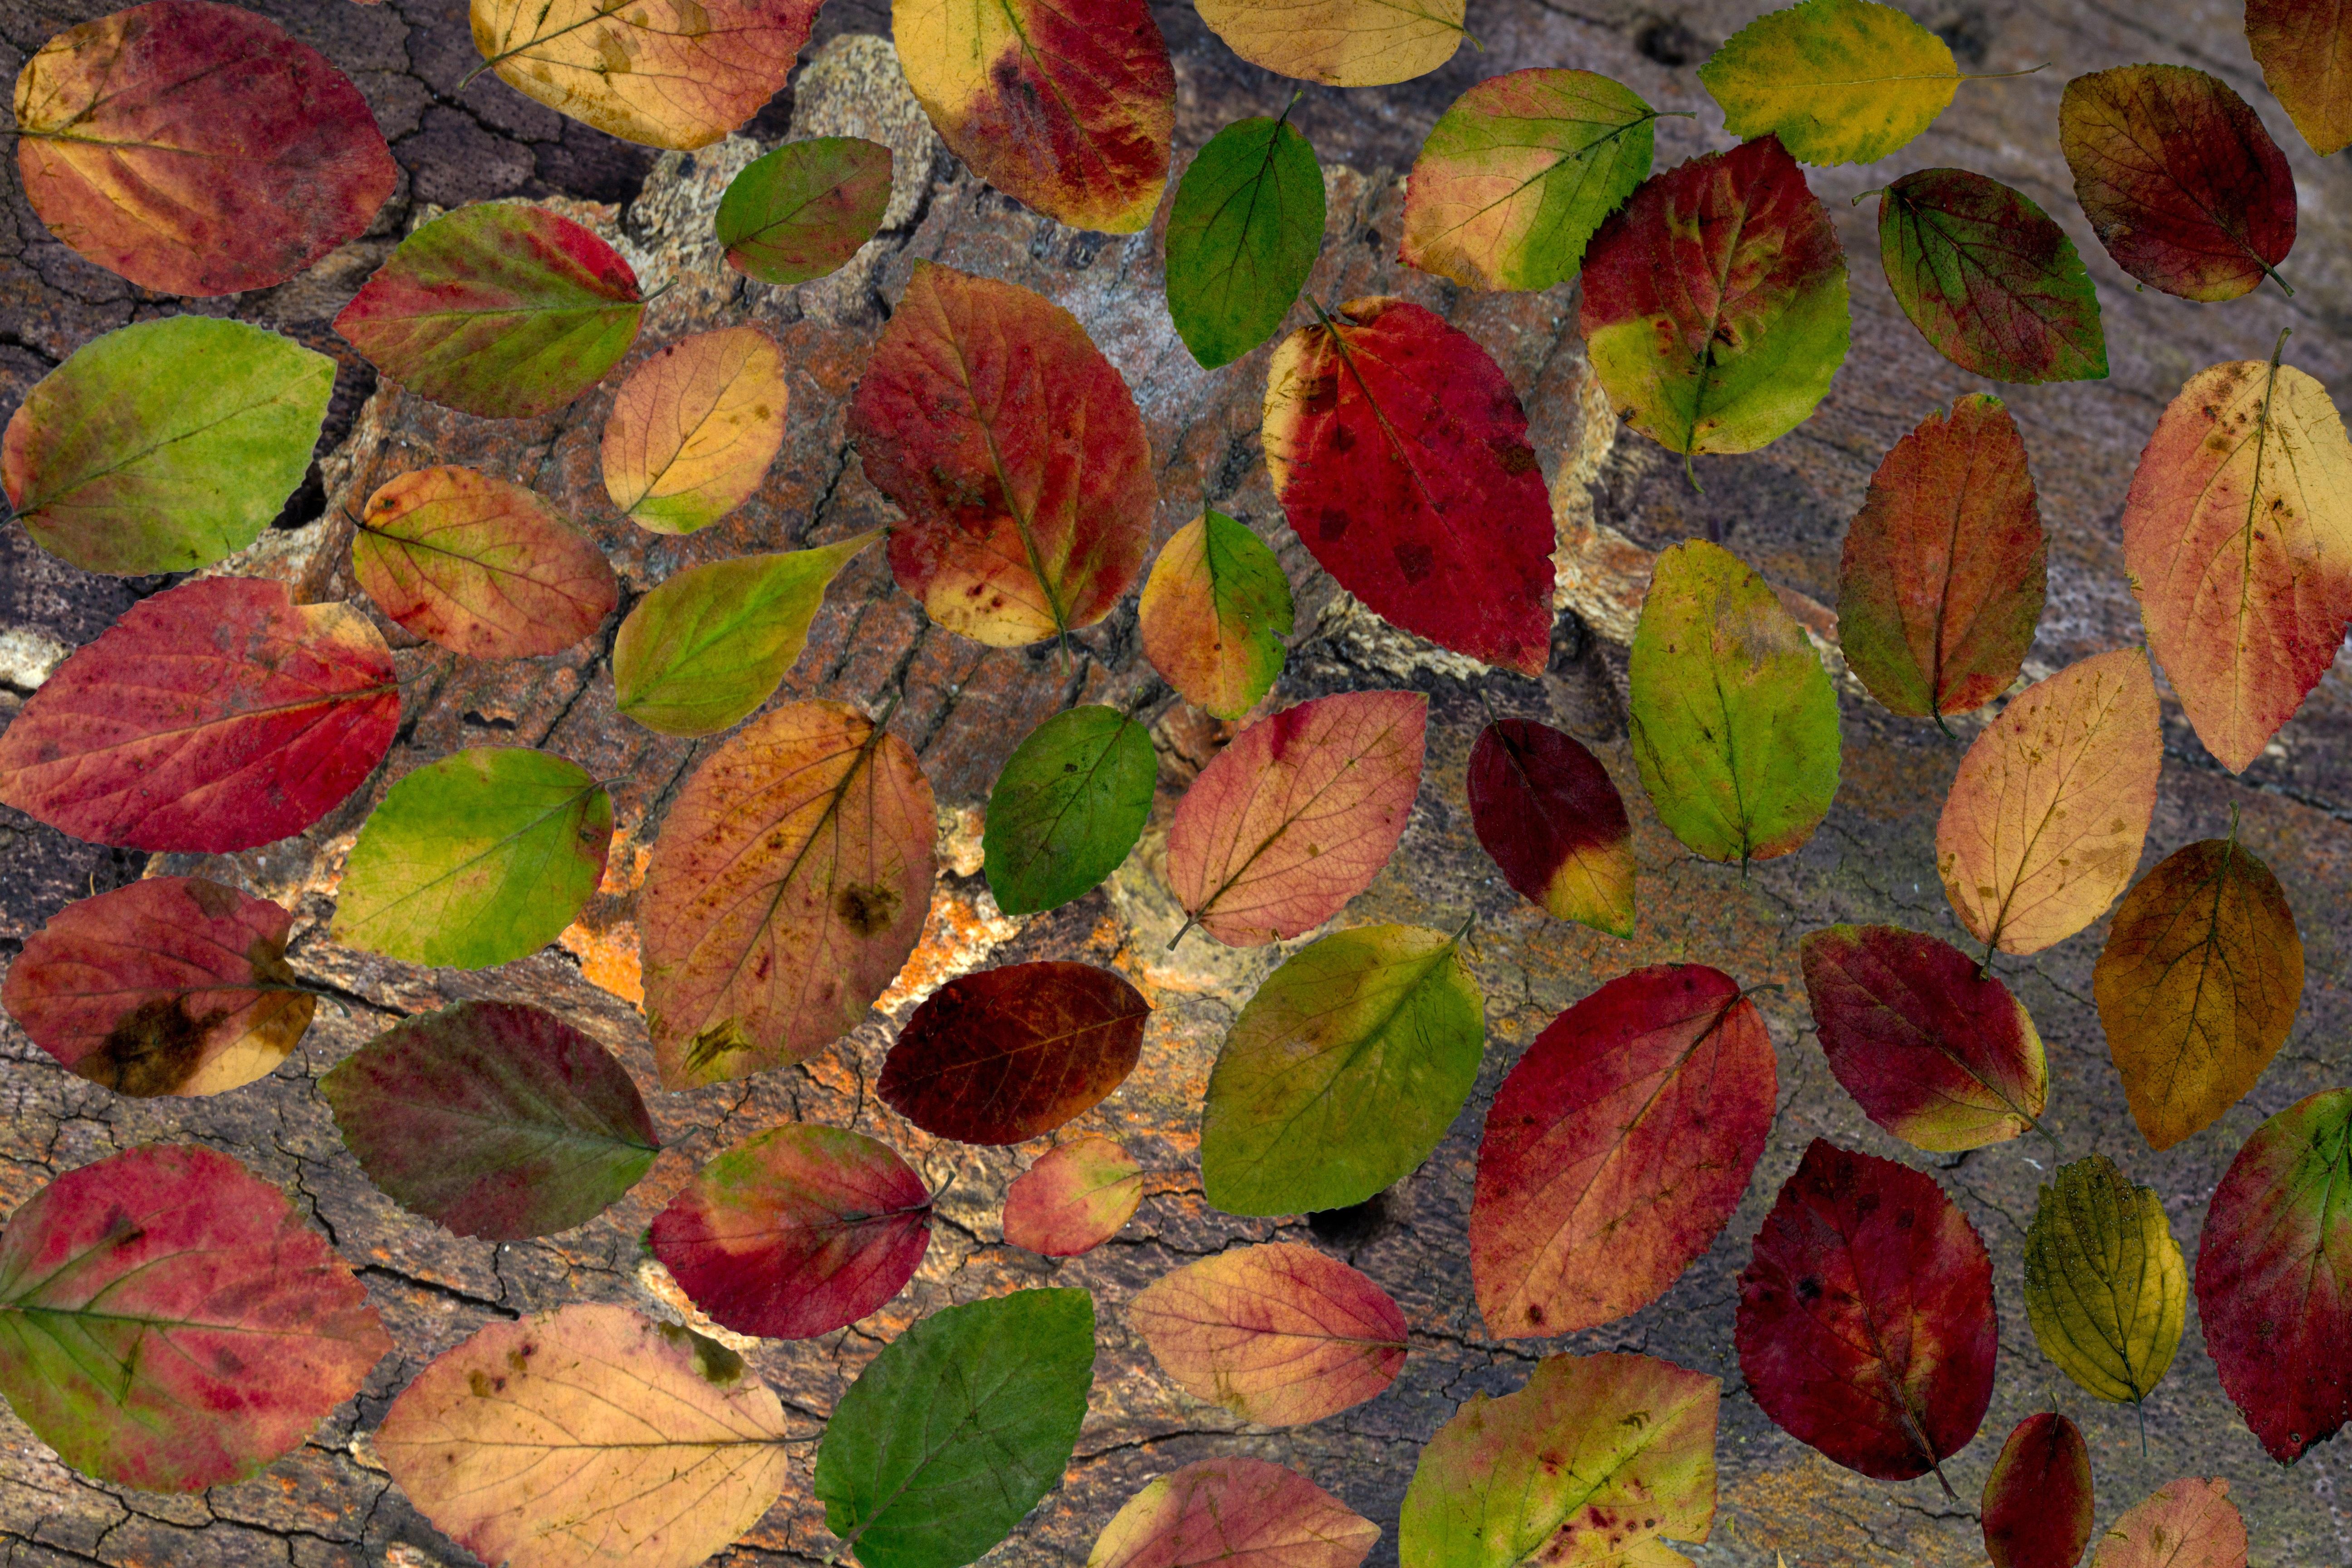 tree branch plant leaf arid flower petal dry foliage pattern red autumn botany colorful flora season maple arrangement leaves design deciduous composition autumn leaf true leaves foliage leaf flowering plant land plant 556517